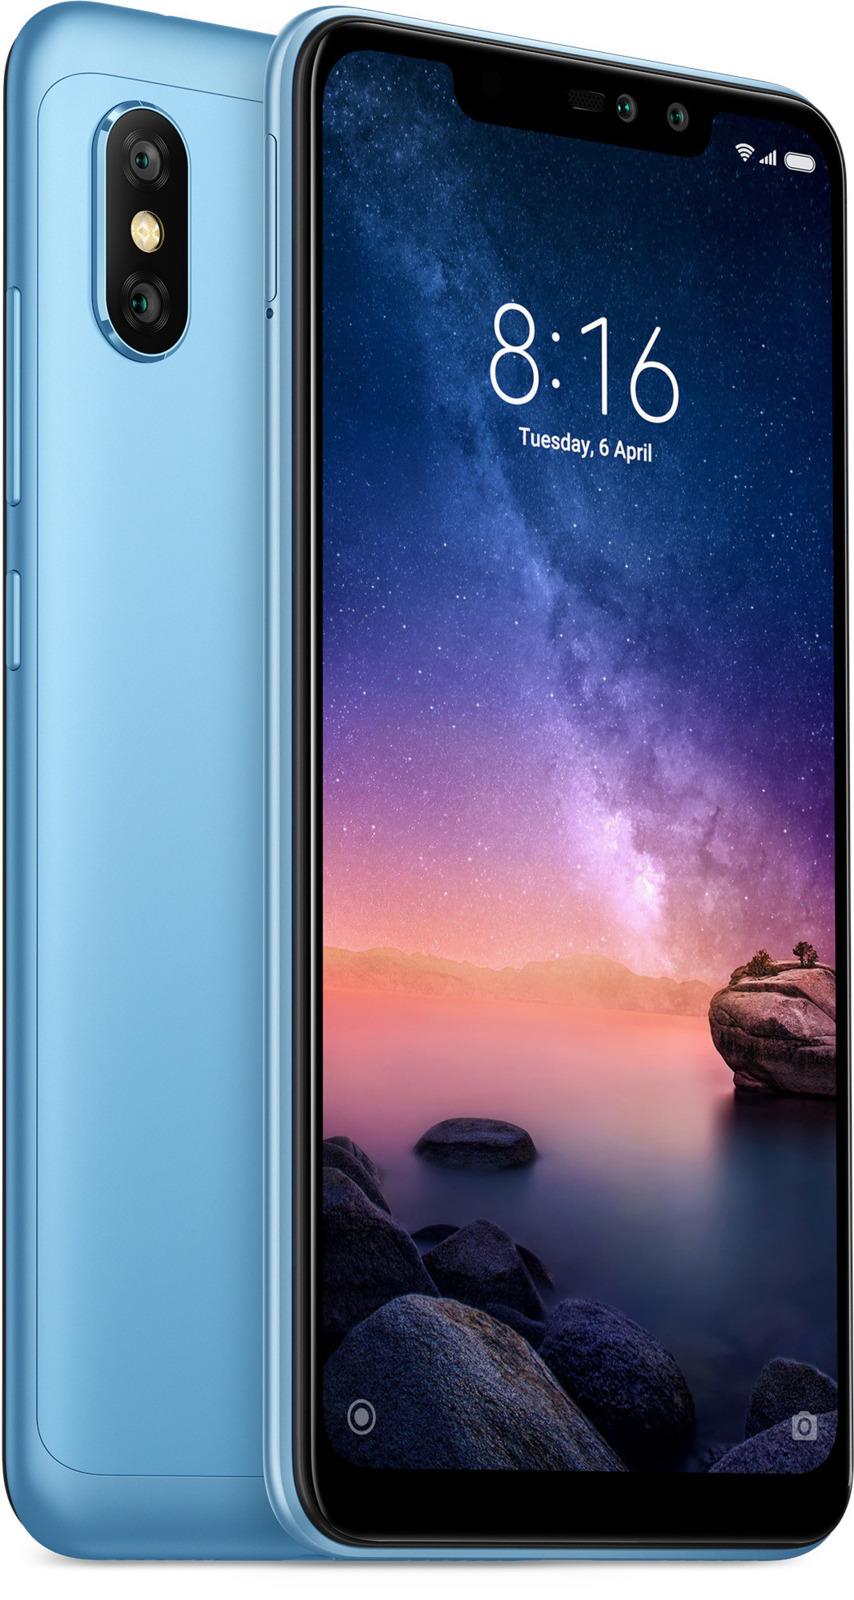 Смартфон Xiaomi Redmi Note 6 Pro 4/64GB, синий цена и фото